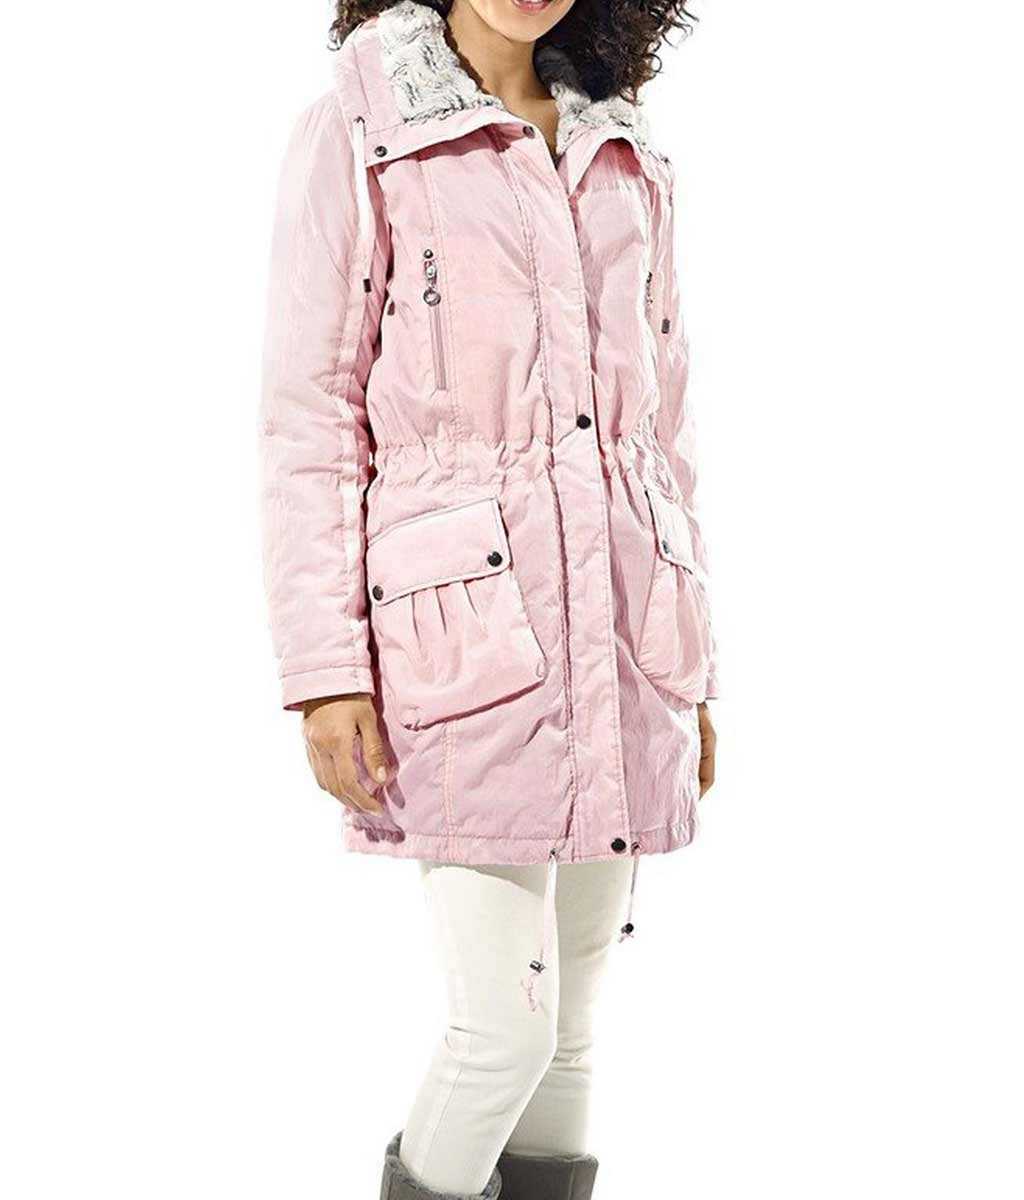 Damenmäntel Frühjahr 2021 HEINE Damen Designer-Parka m. Webpelz Rosé Rosa Freizeit Casual 012.679 Missforty